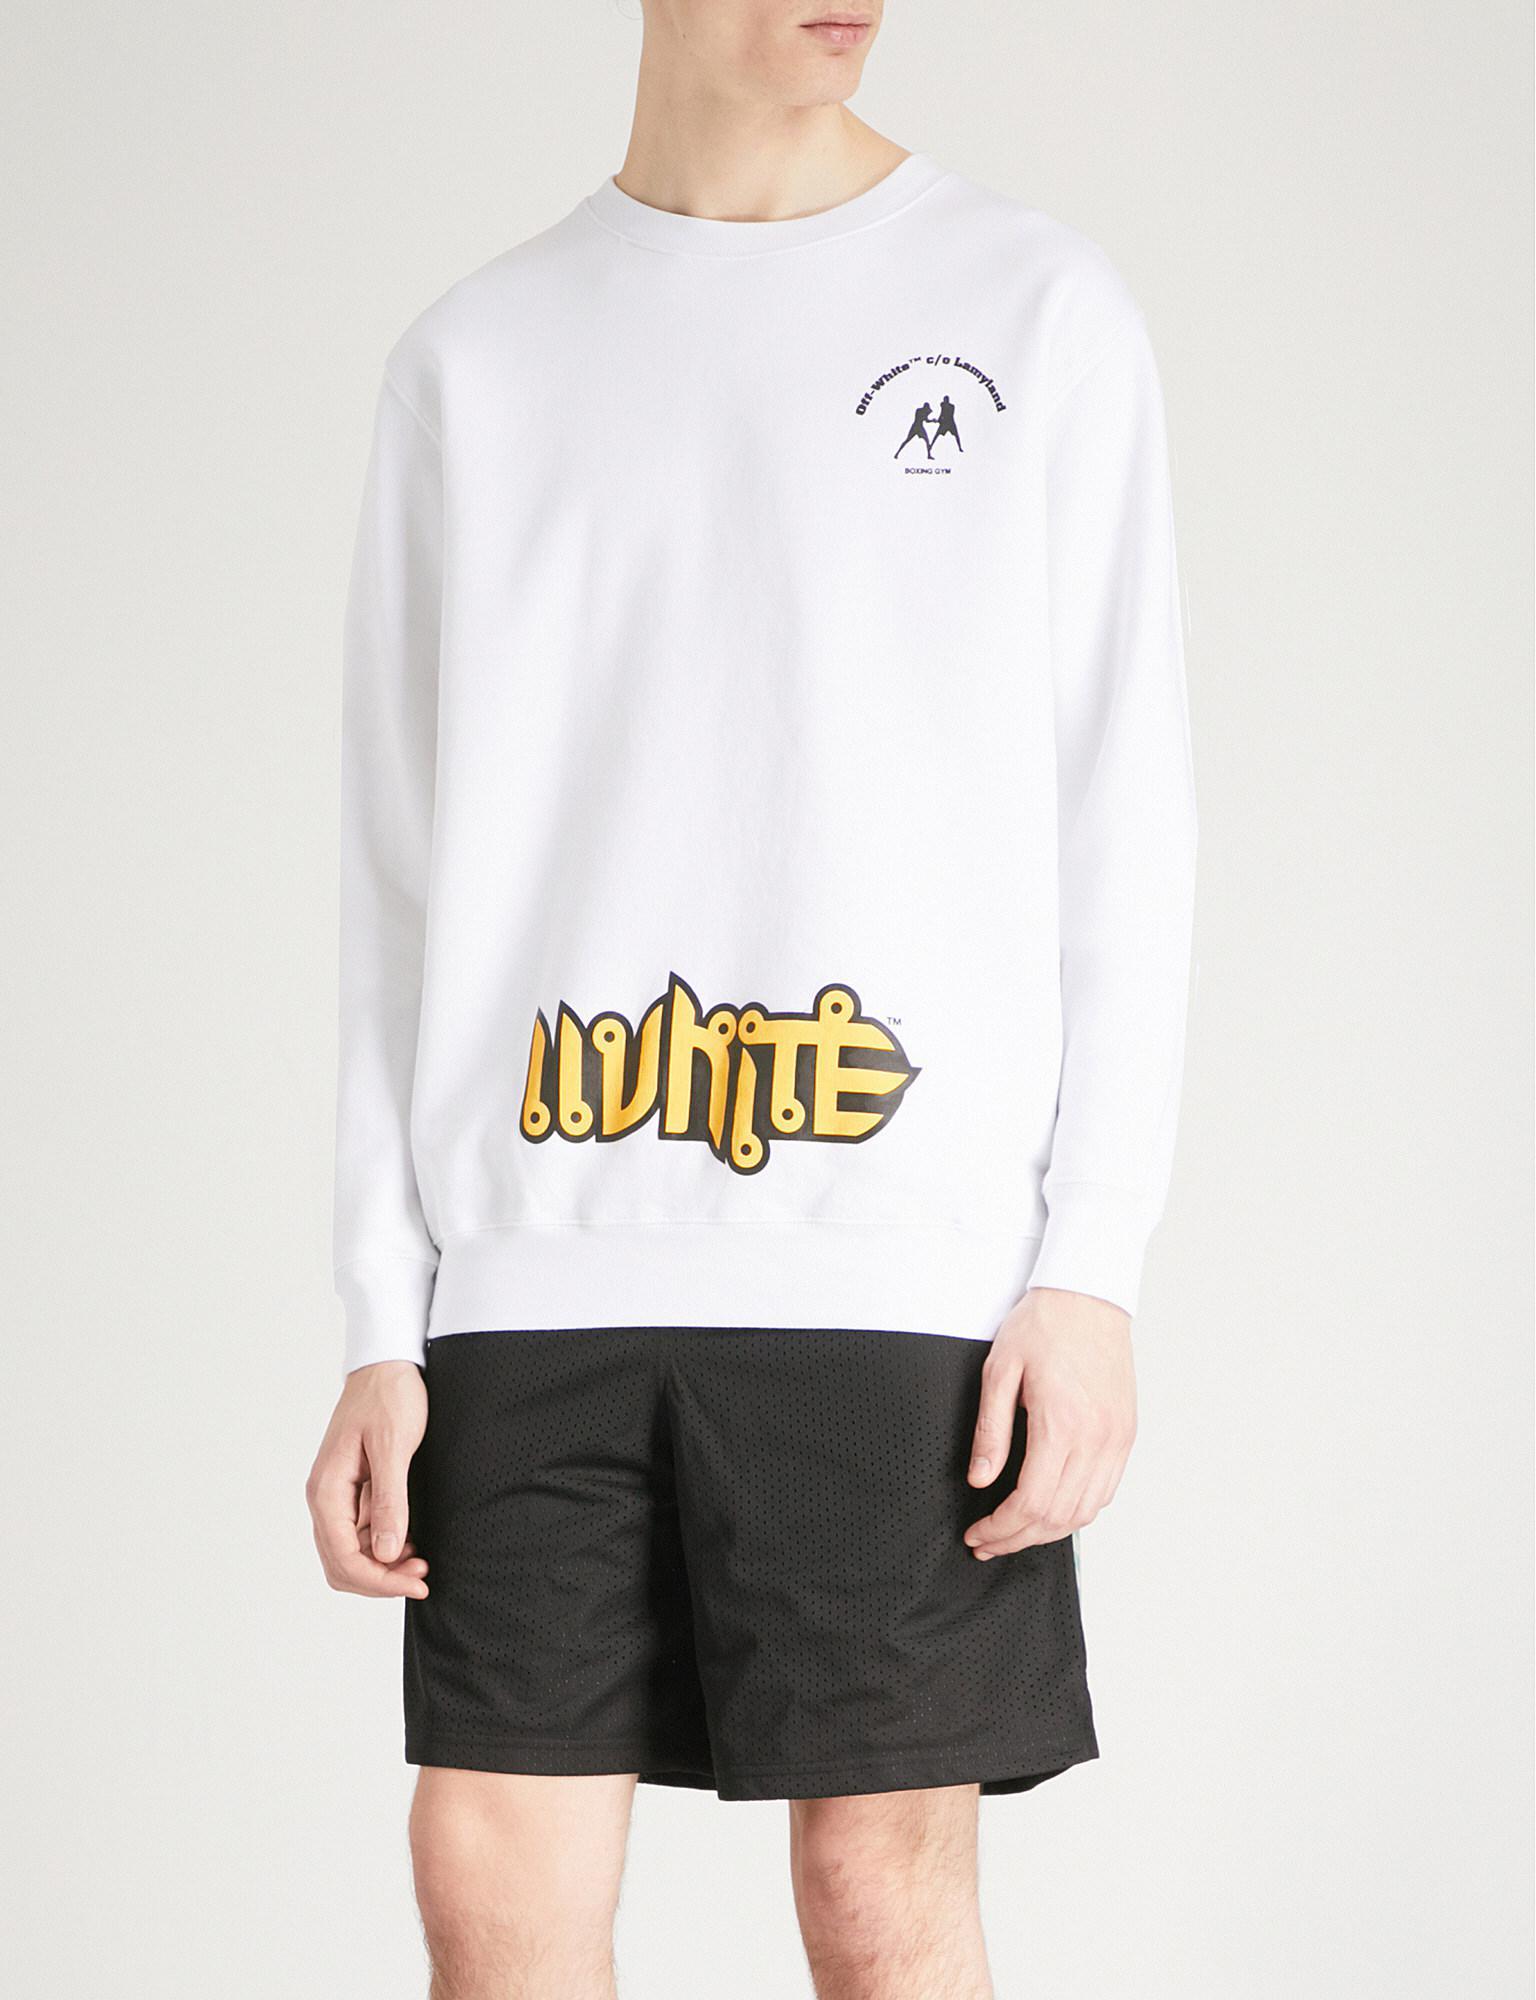 758031c09d03 Off-White C O Virgil Abloh Lamyland Cotton-jersey Sweatshirt in ...